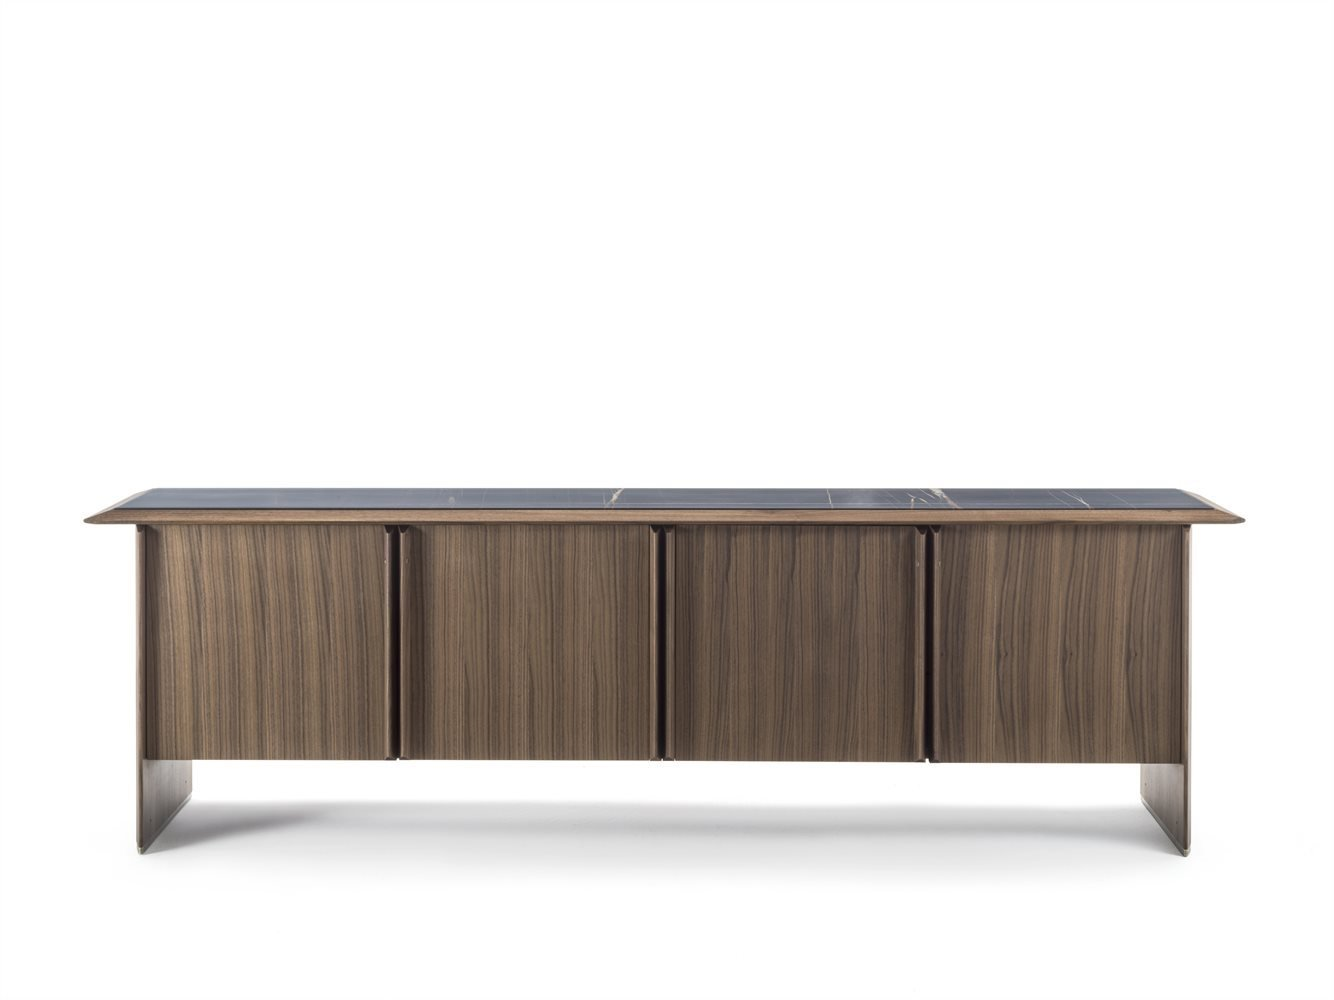 Tamok Sideboard cabinet from Porada, designed by Gabriele & Oscar Buratti